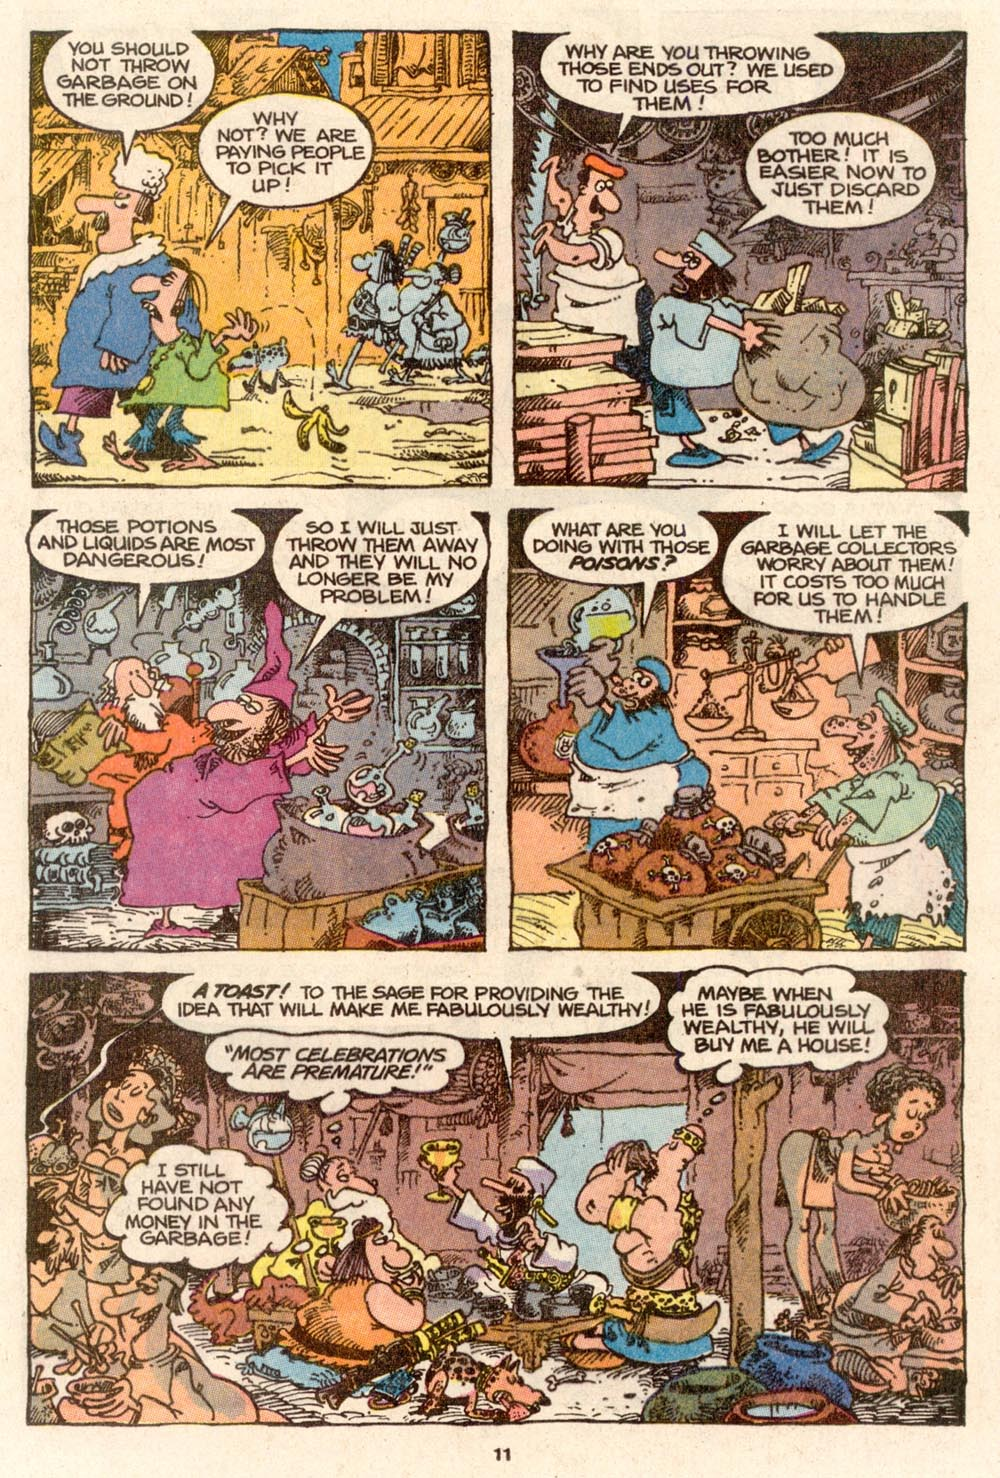 Read online Sergio Aragonés Groo the Wanderer comic -  Issue #65 - 11